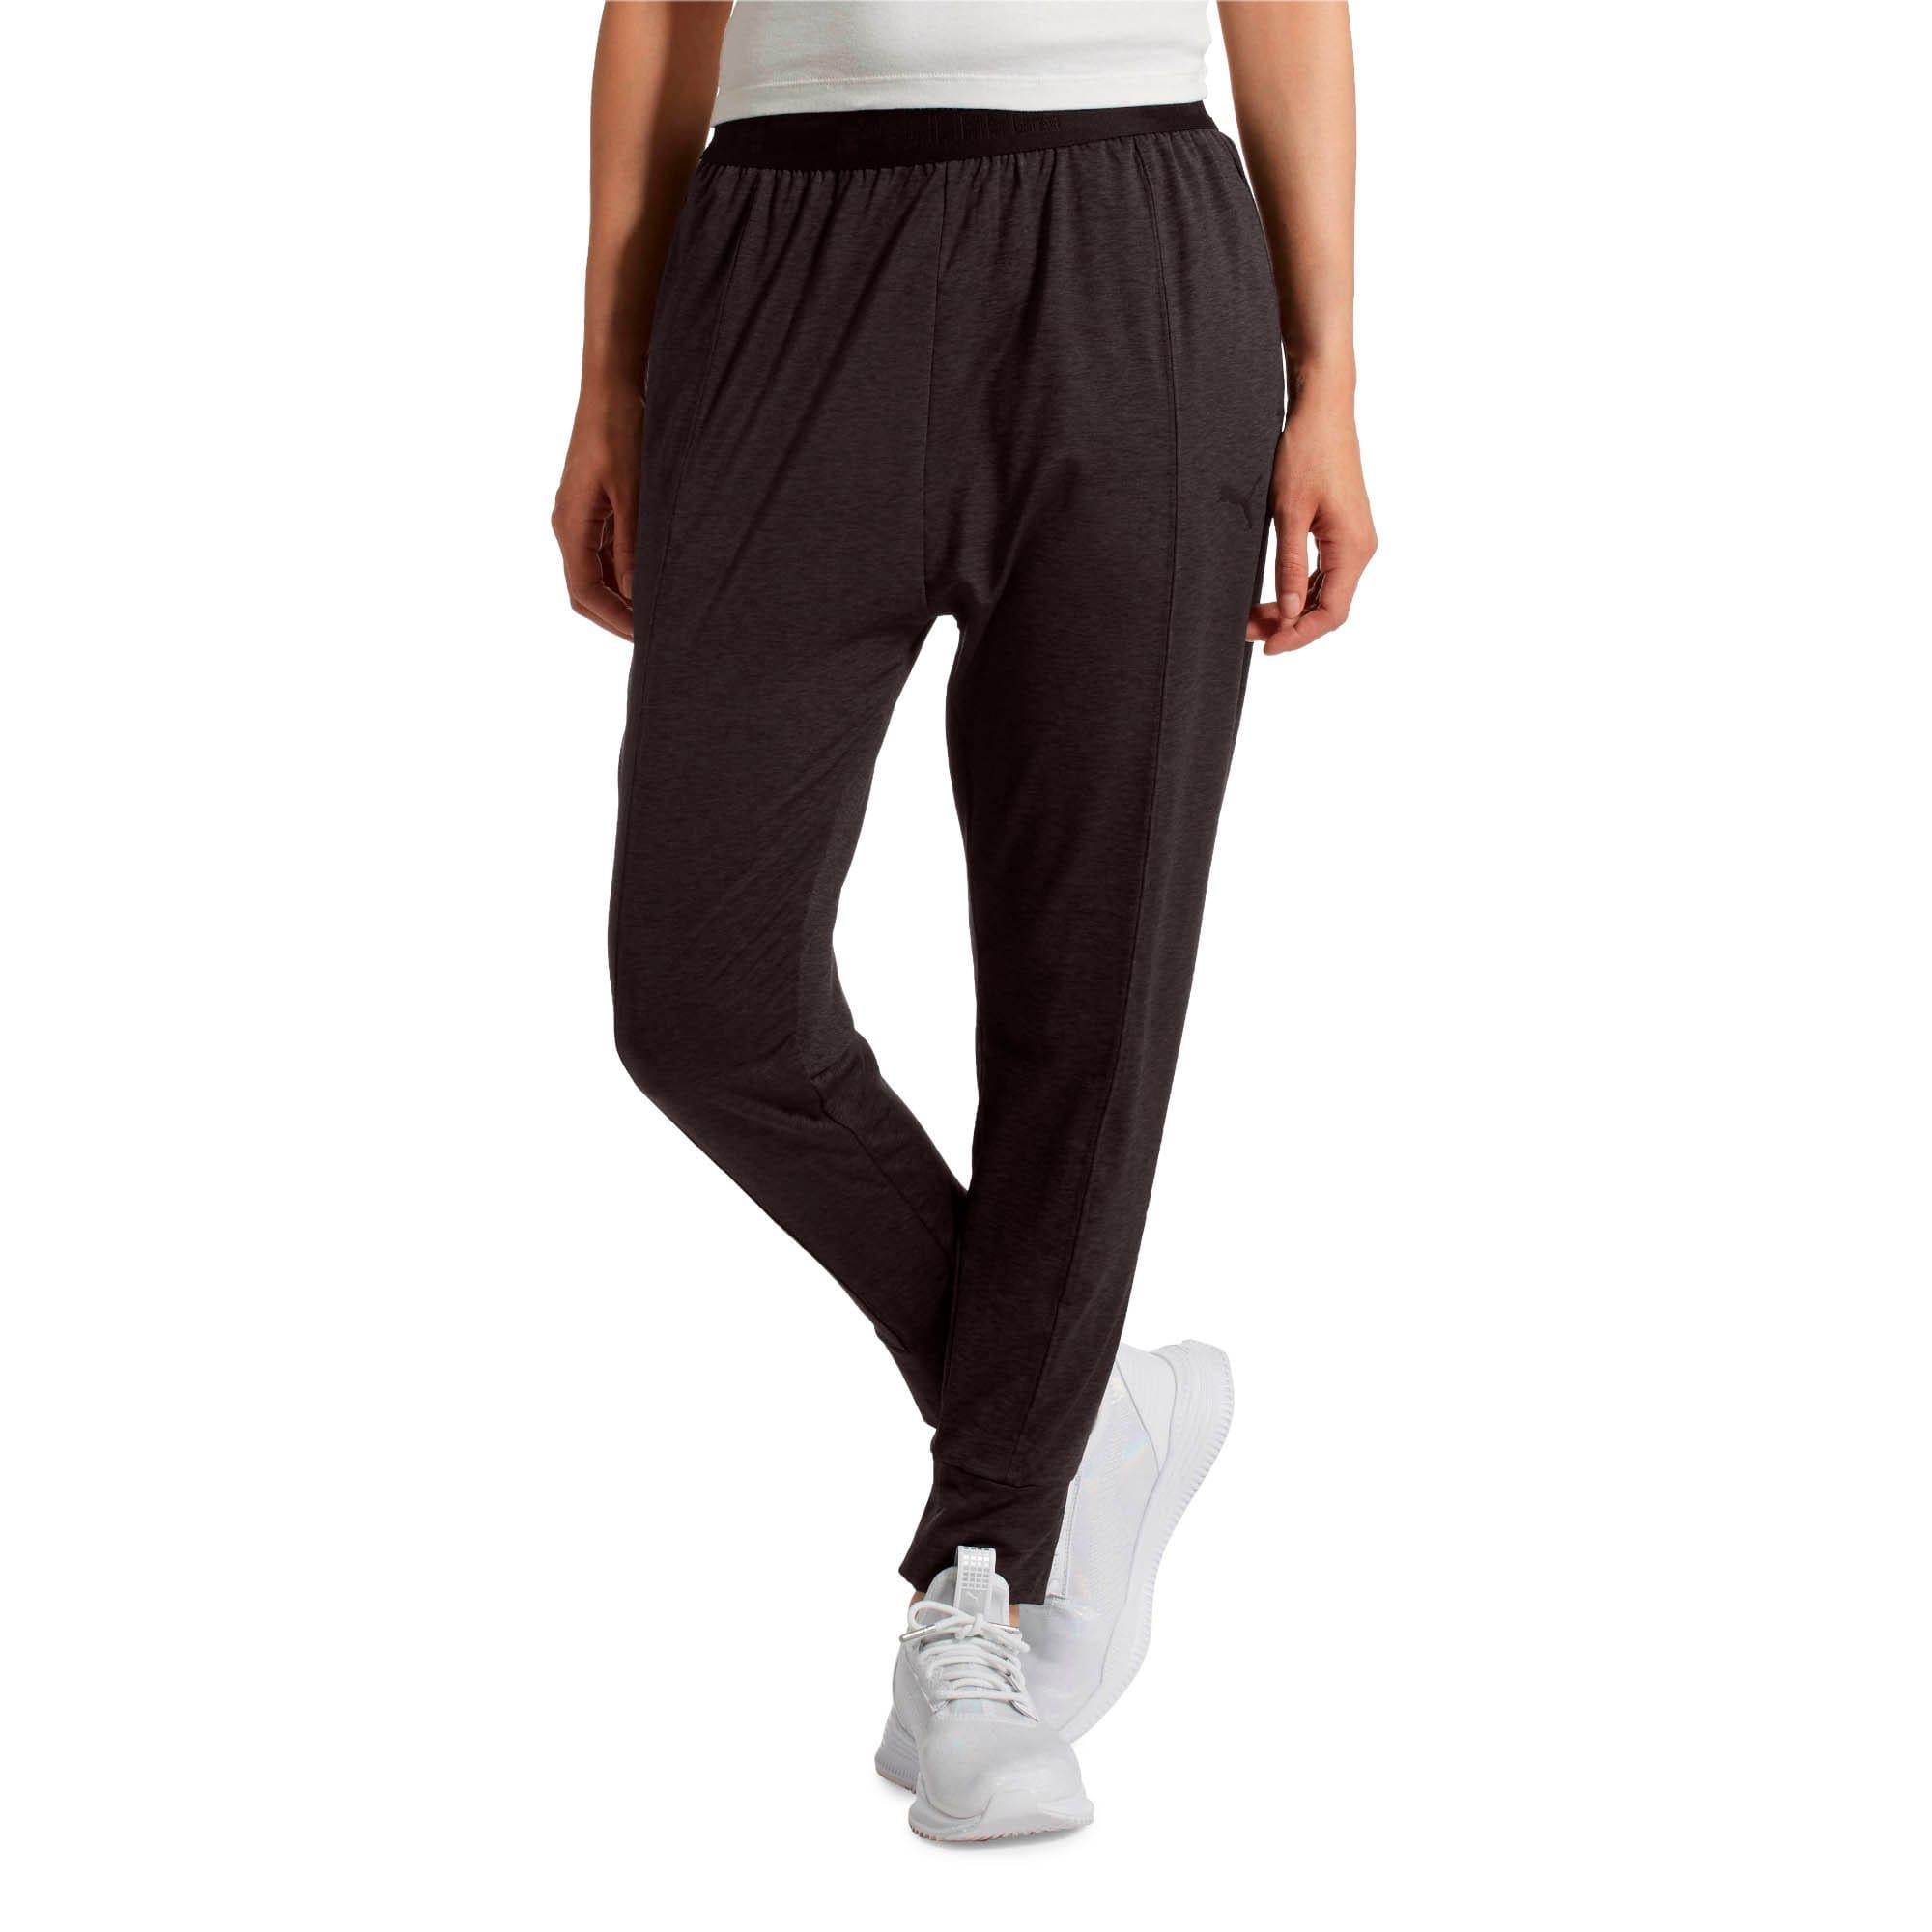 Thumbnail 2 of Soft Sport Women's Sweatpants, Puma Black-heather, medium